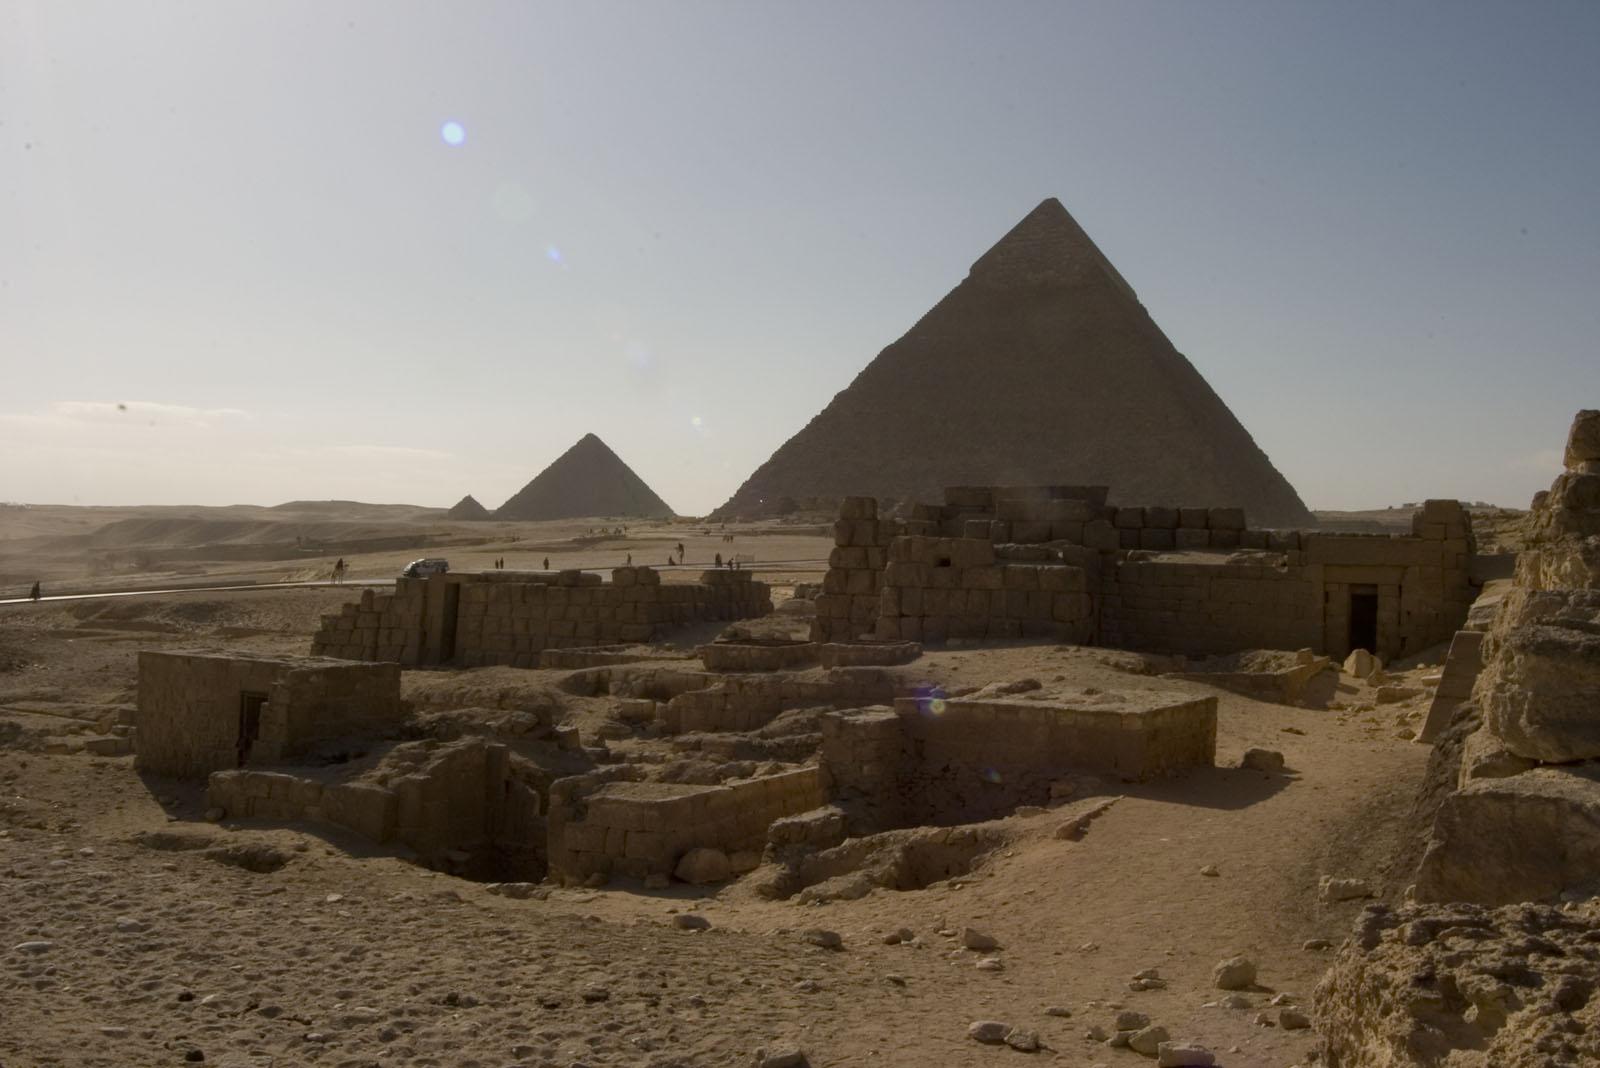 Eastern Cemetery: Site: Giza; View: G 7150, G 7151, G 7152, G 7153, G 7142, G 7143, G 7144, G 7164, G 7168, G 7259, G 7247, G 7254